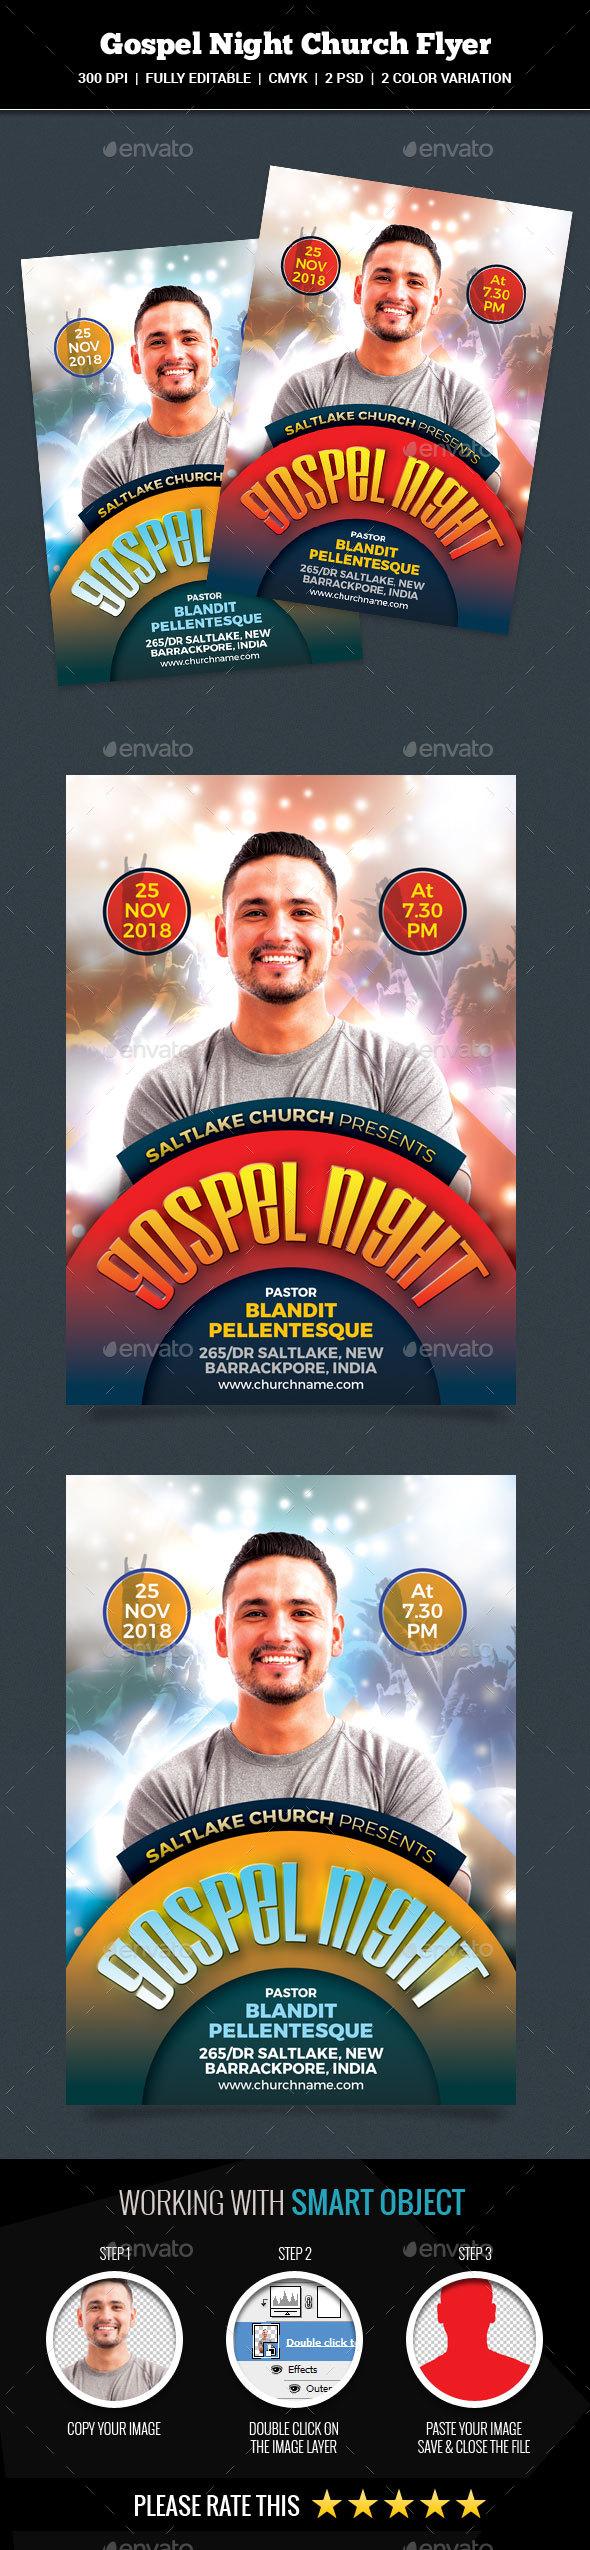 GraphicRiver Gospel Night Church Flyer 20942895